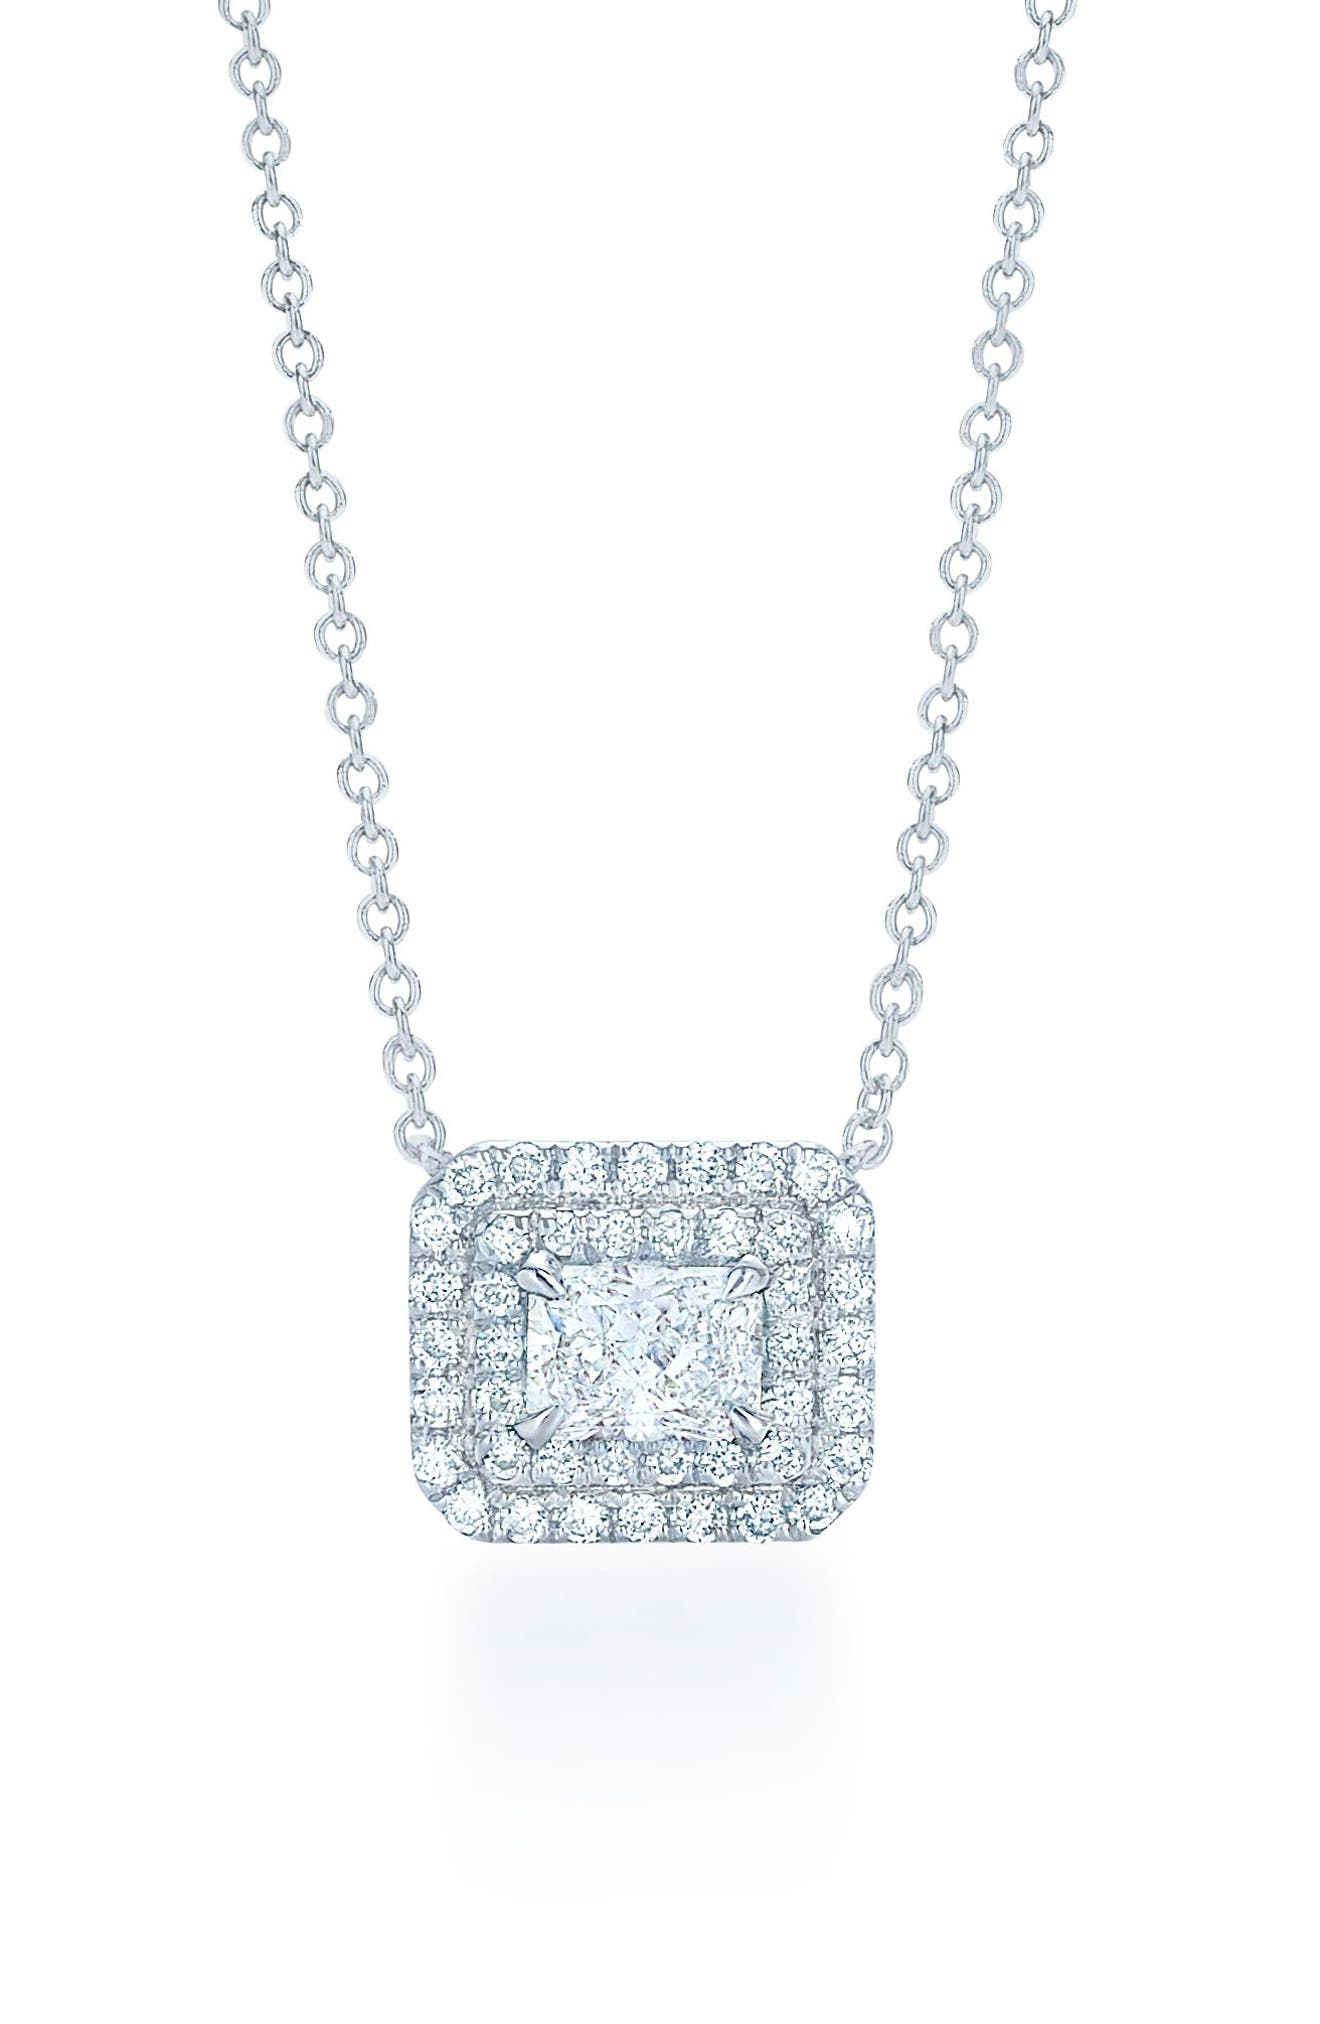 Radiant Cut Diamond Necklace,                             Main thumbnail 1, color,                             711